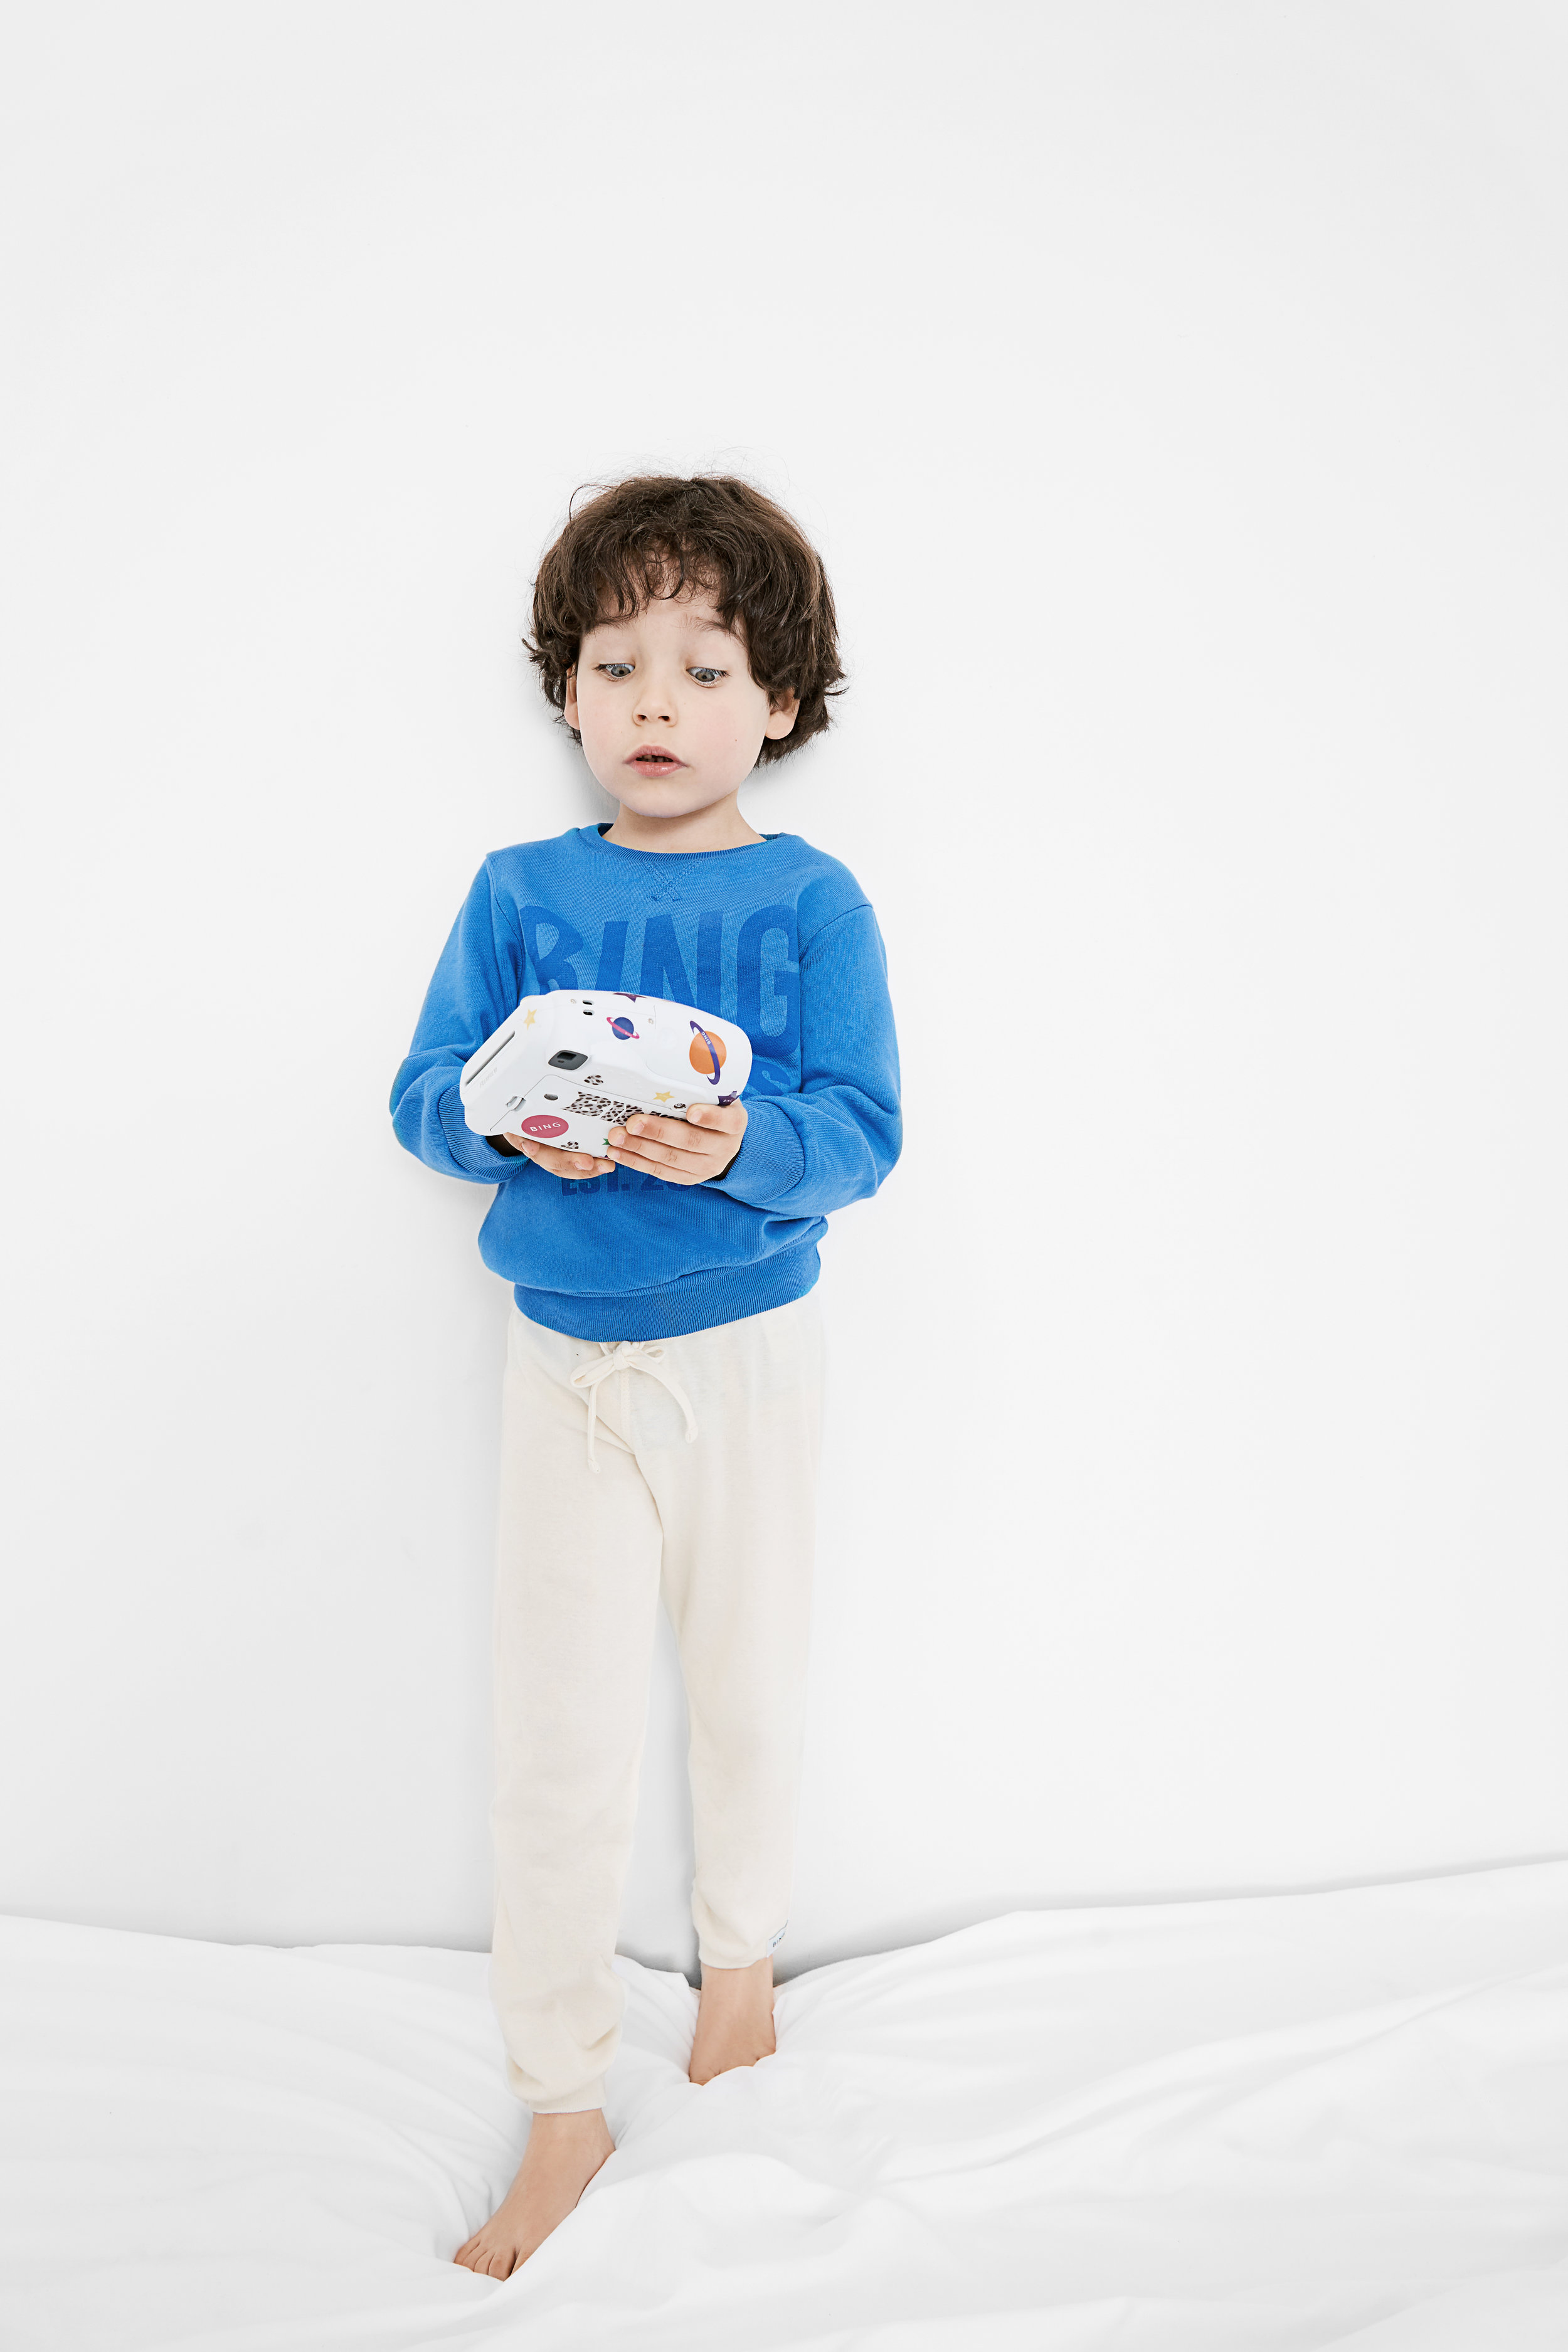 BING-KIDS-SKYLAR-SLEEP-SET-OAT-BK55-001-02_0509.jpg